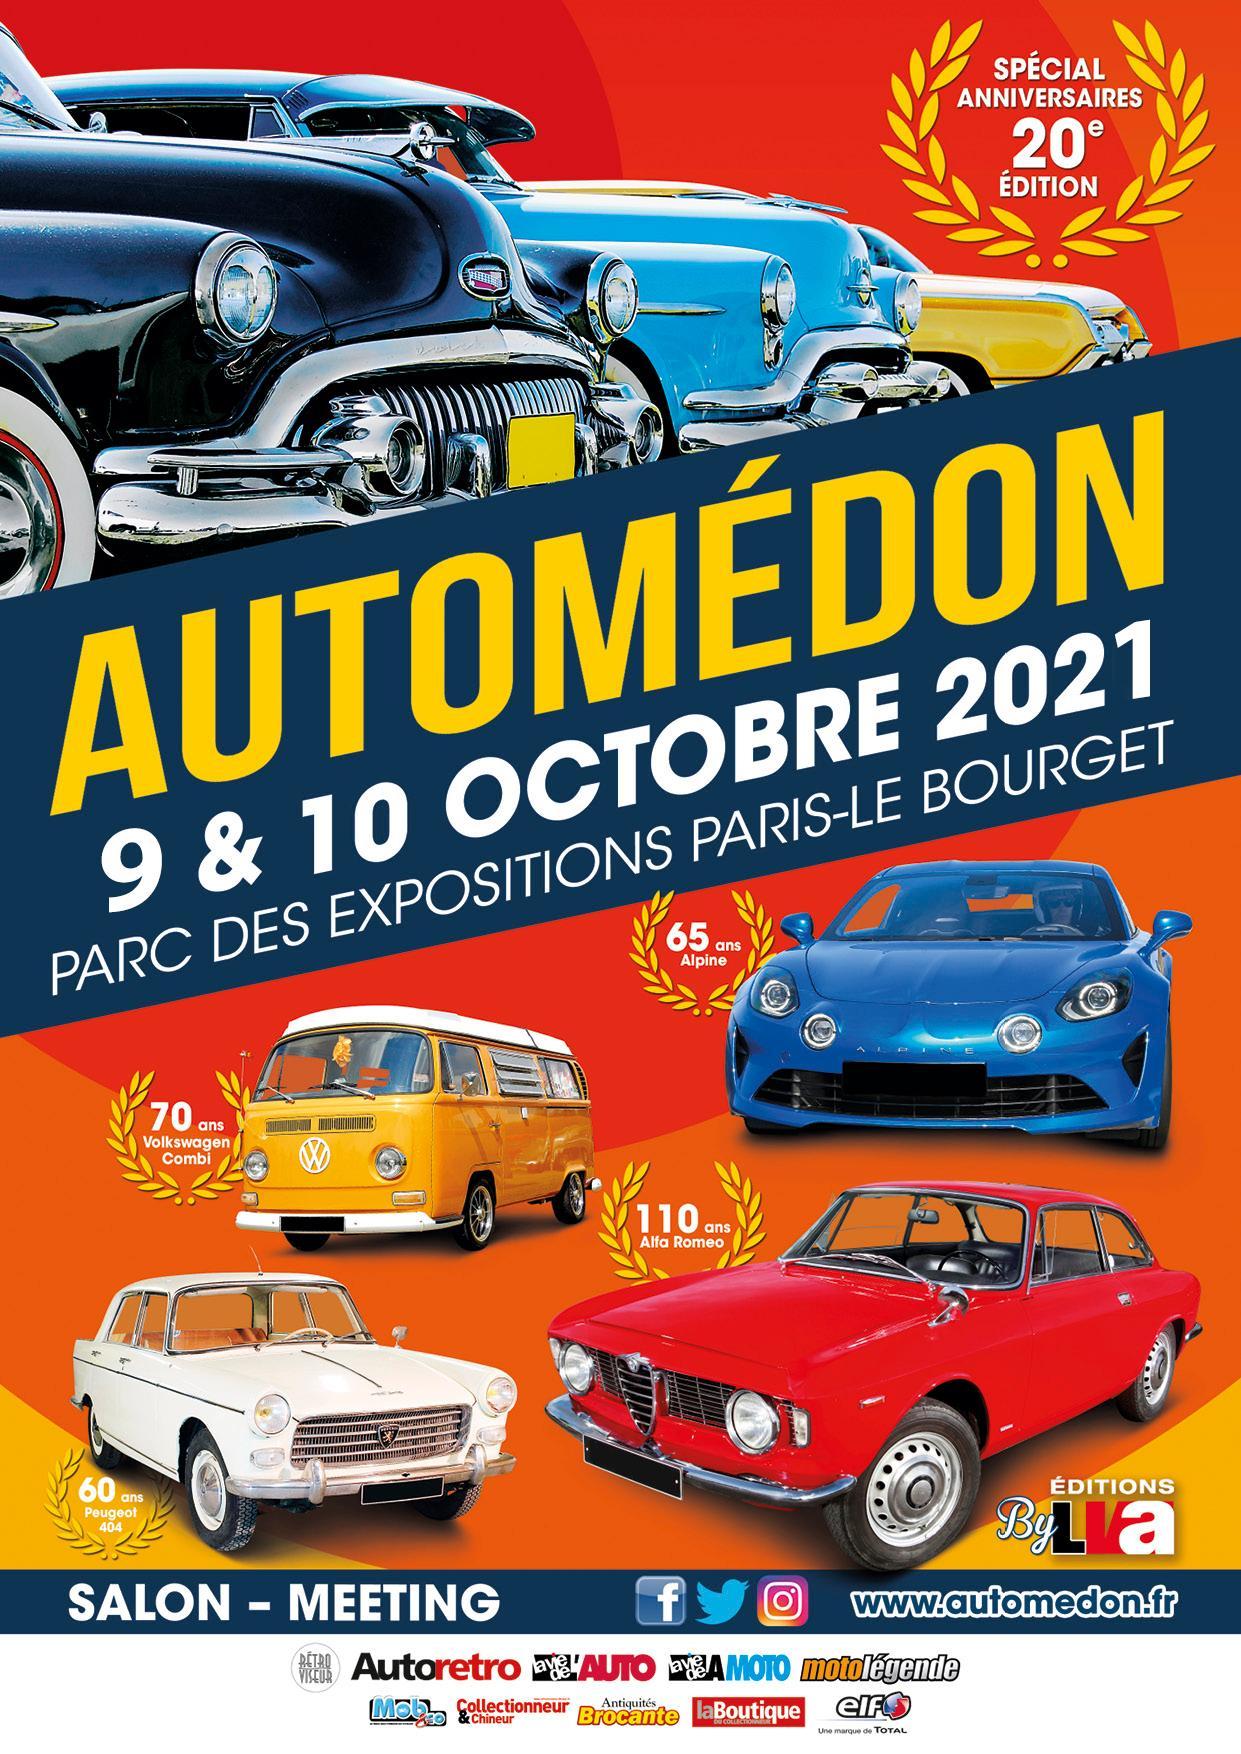 Automedon 2021